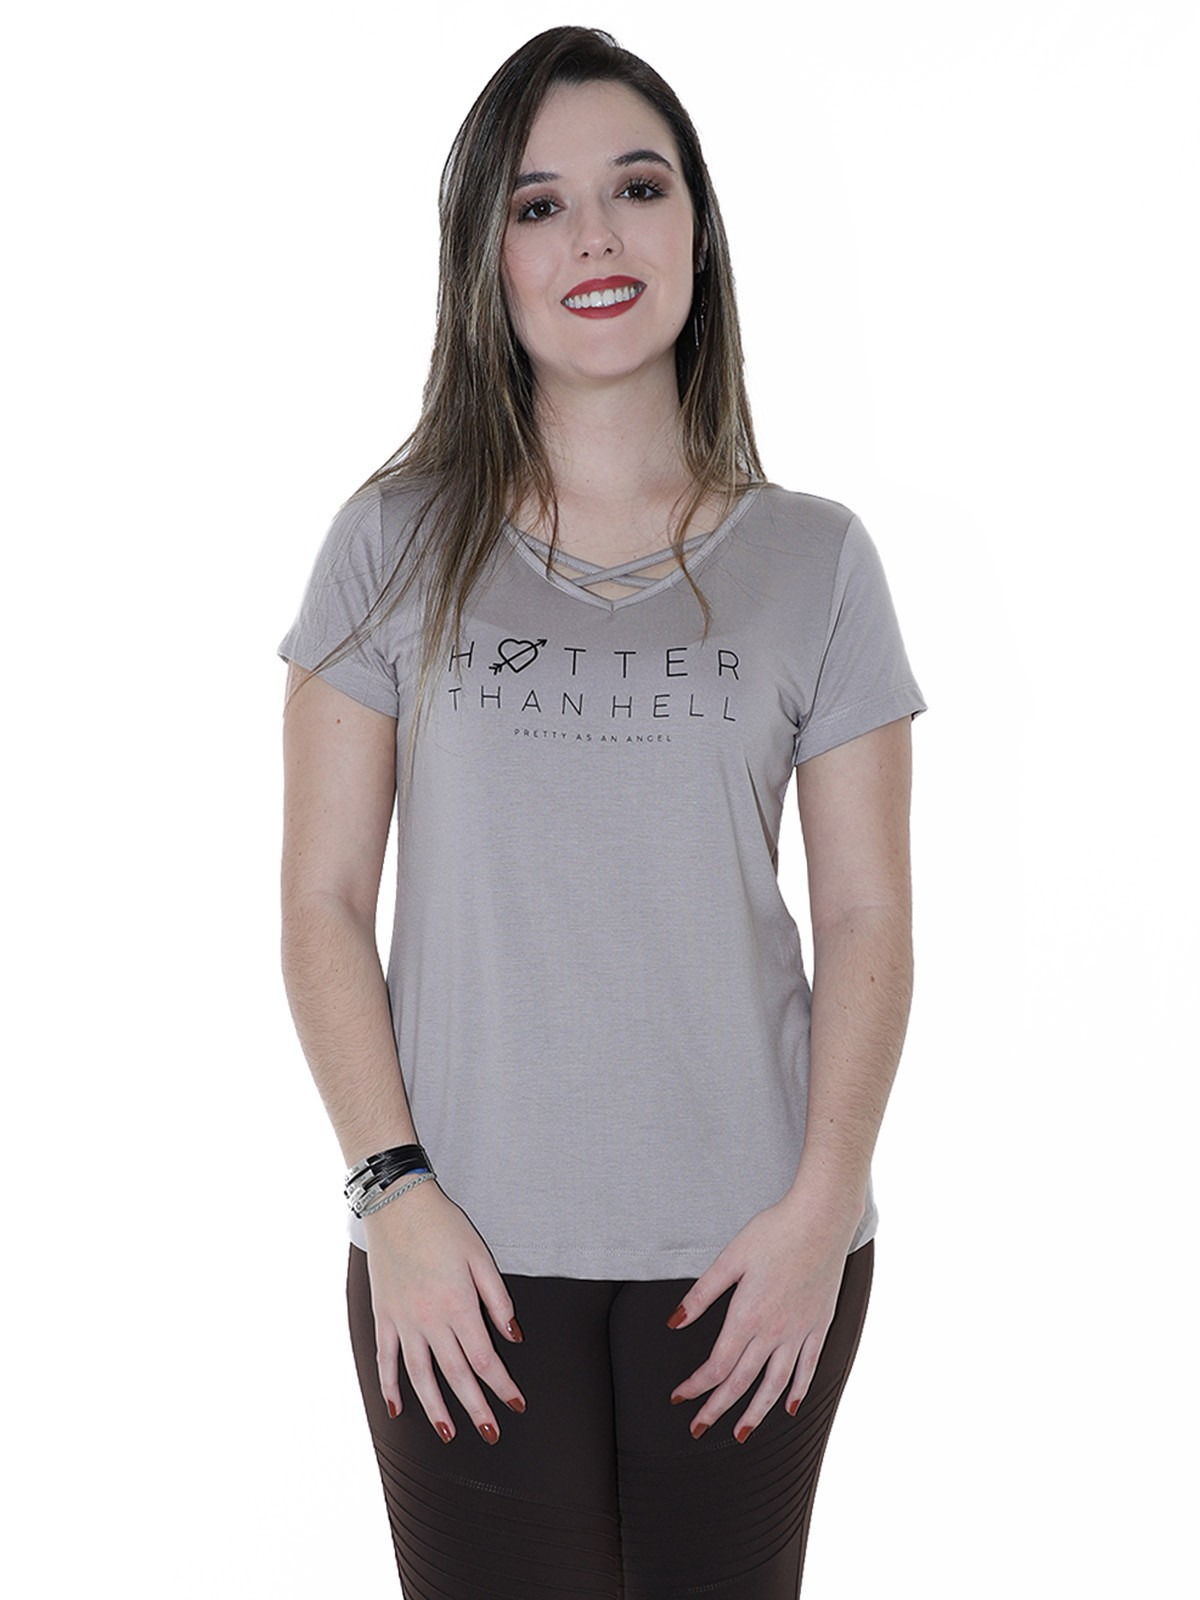 Blusa Feminina Longuete Decote Com Viés Anistia Areia